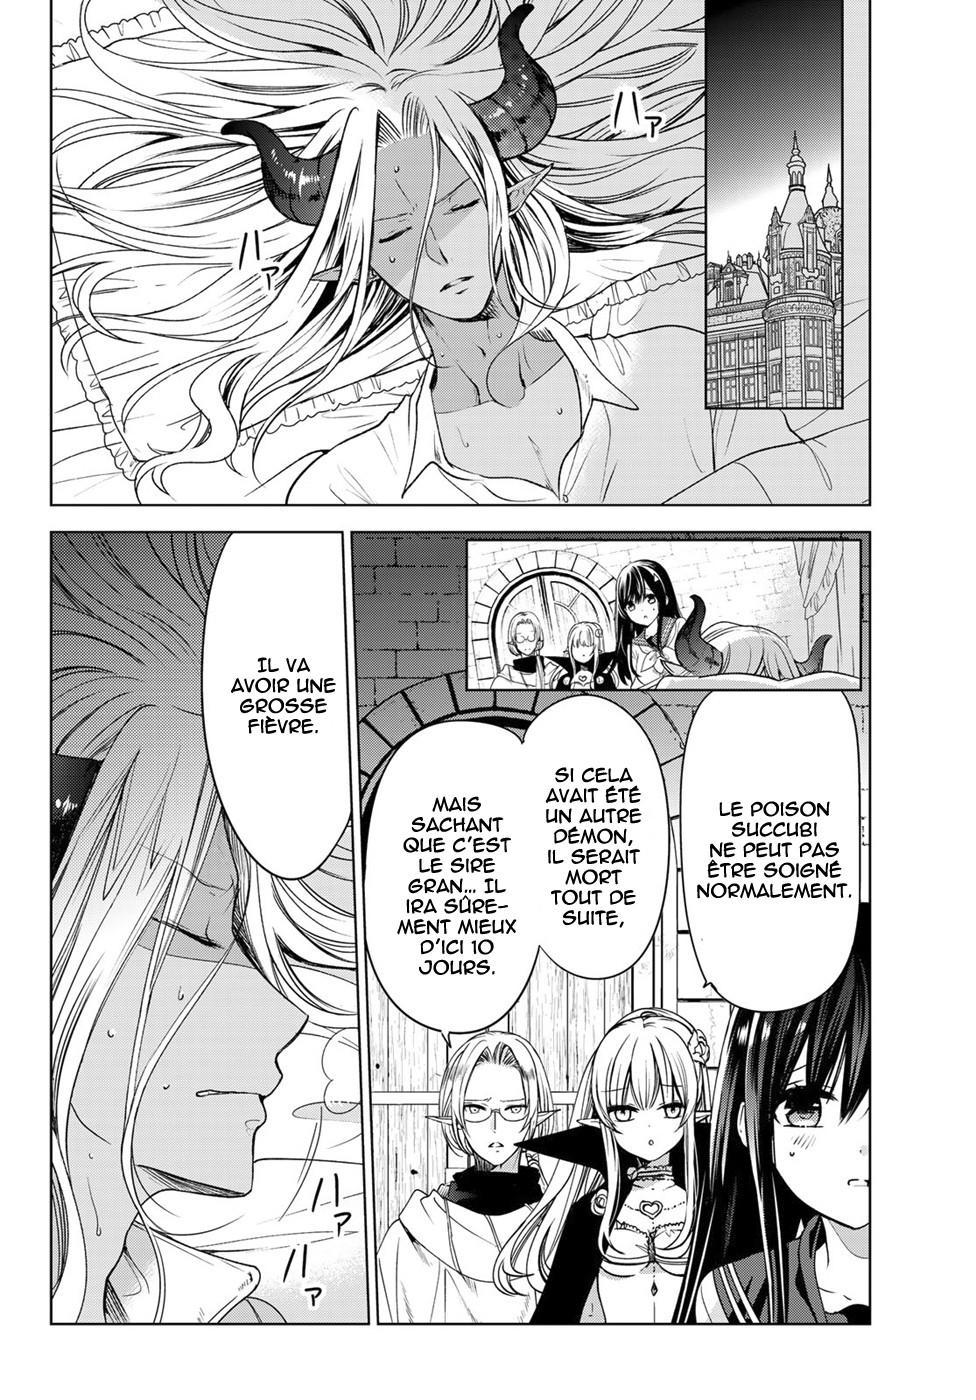 https://nine.mangadogs.com/fr_manga/pic2/41/11177/512515/IsekaideSaikyoMaonoKodomot_15_344.jpg Page 16